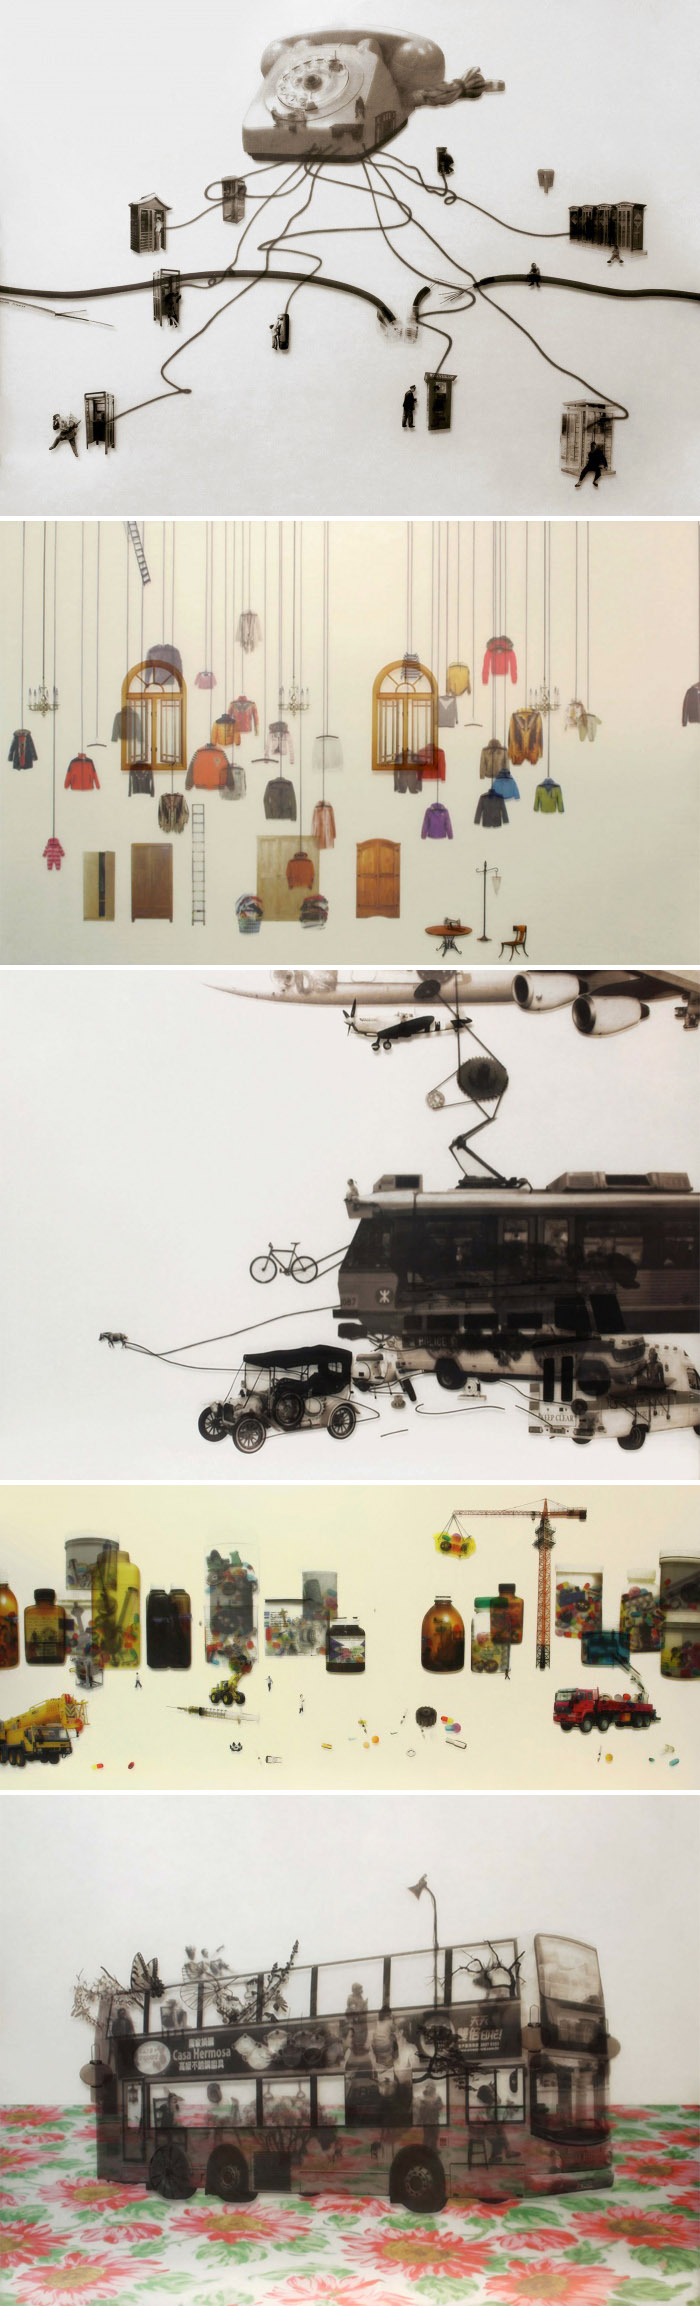 mixed media, Contemporary art from Hong Kong, Tang Kwok Hin, collage, collabcubed